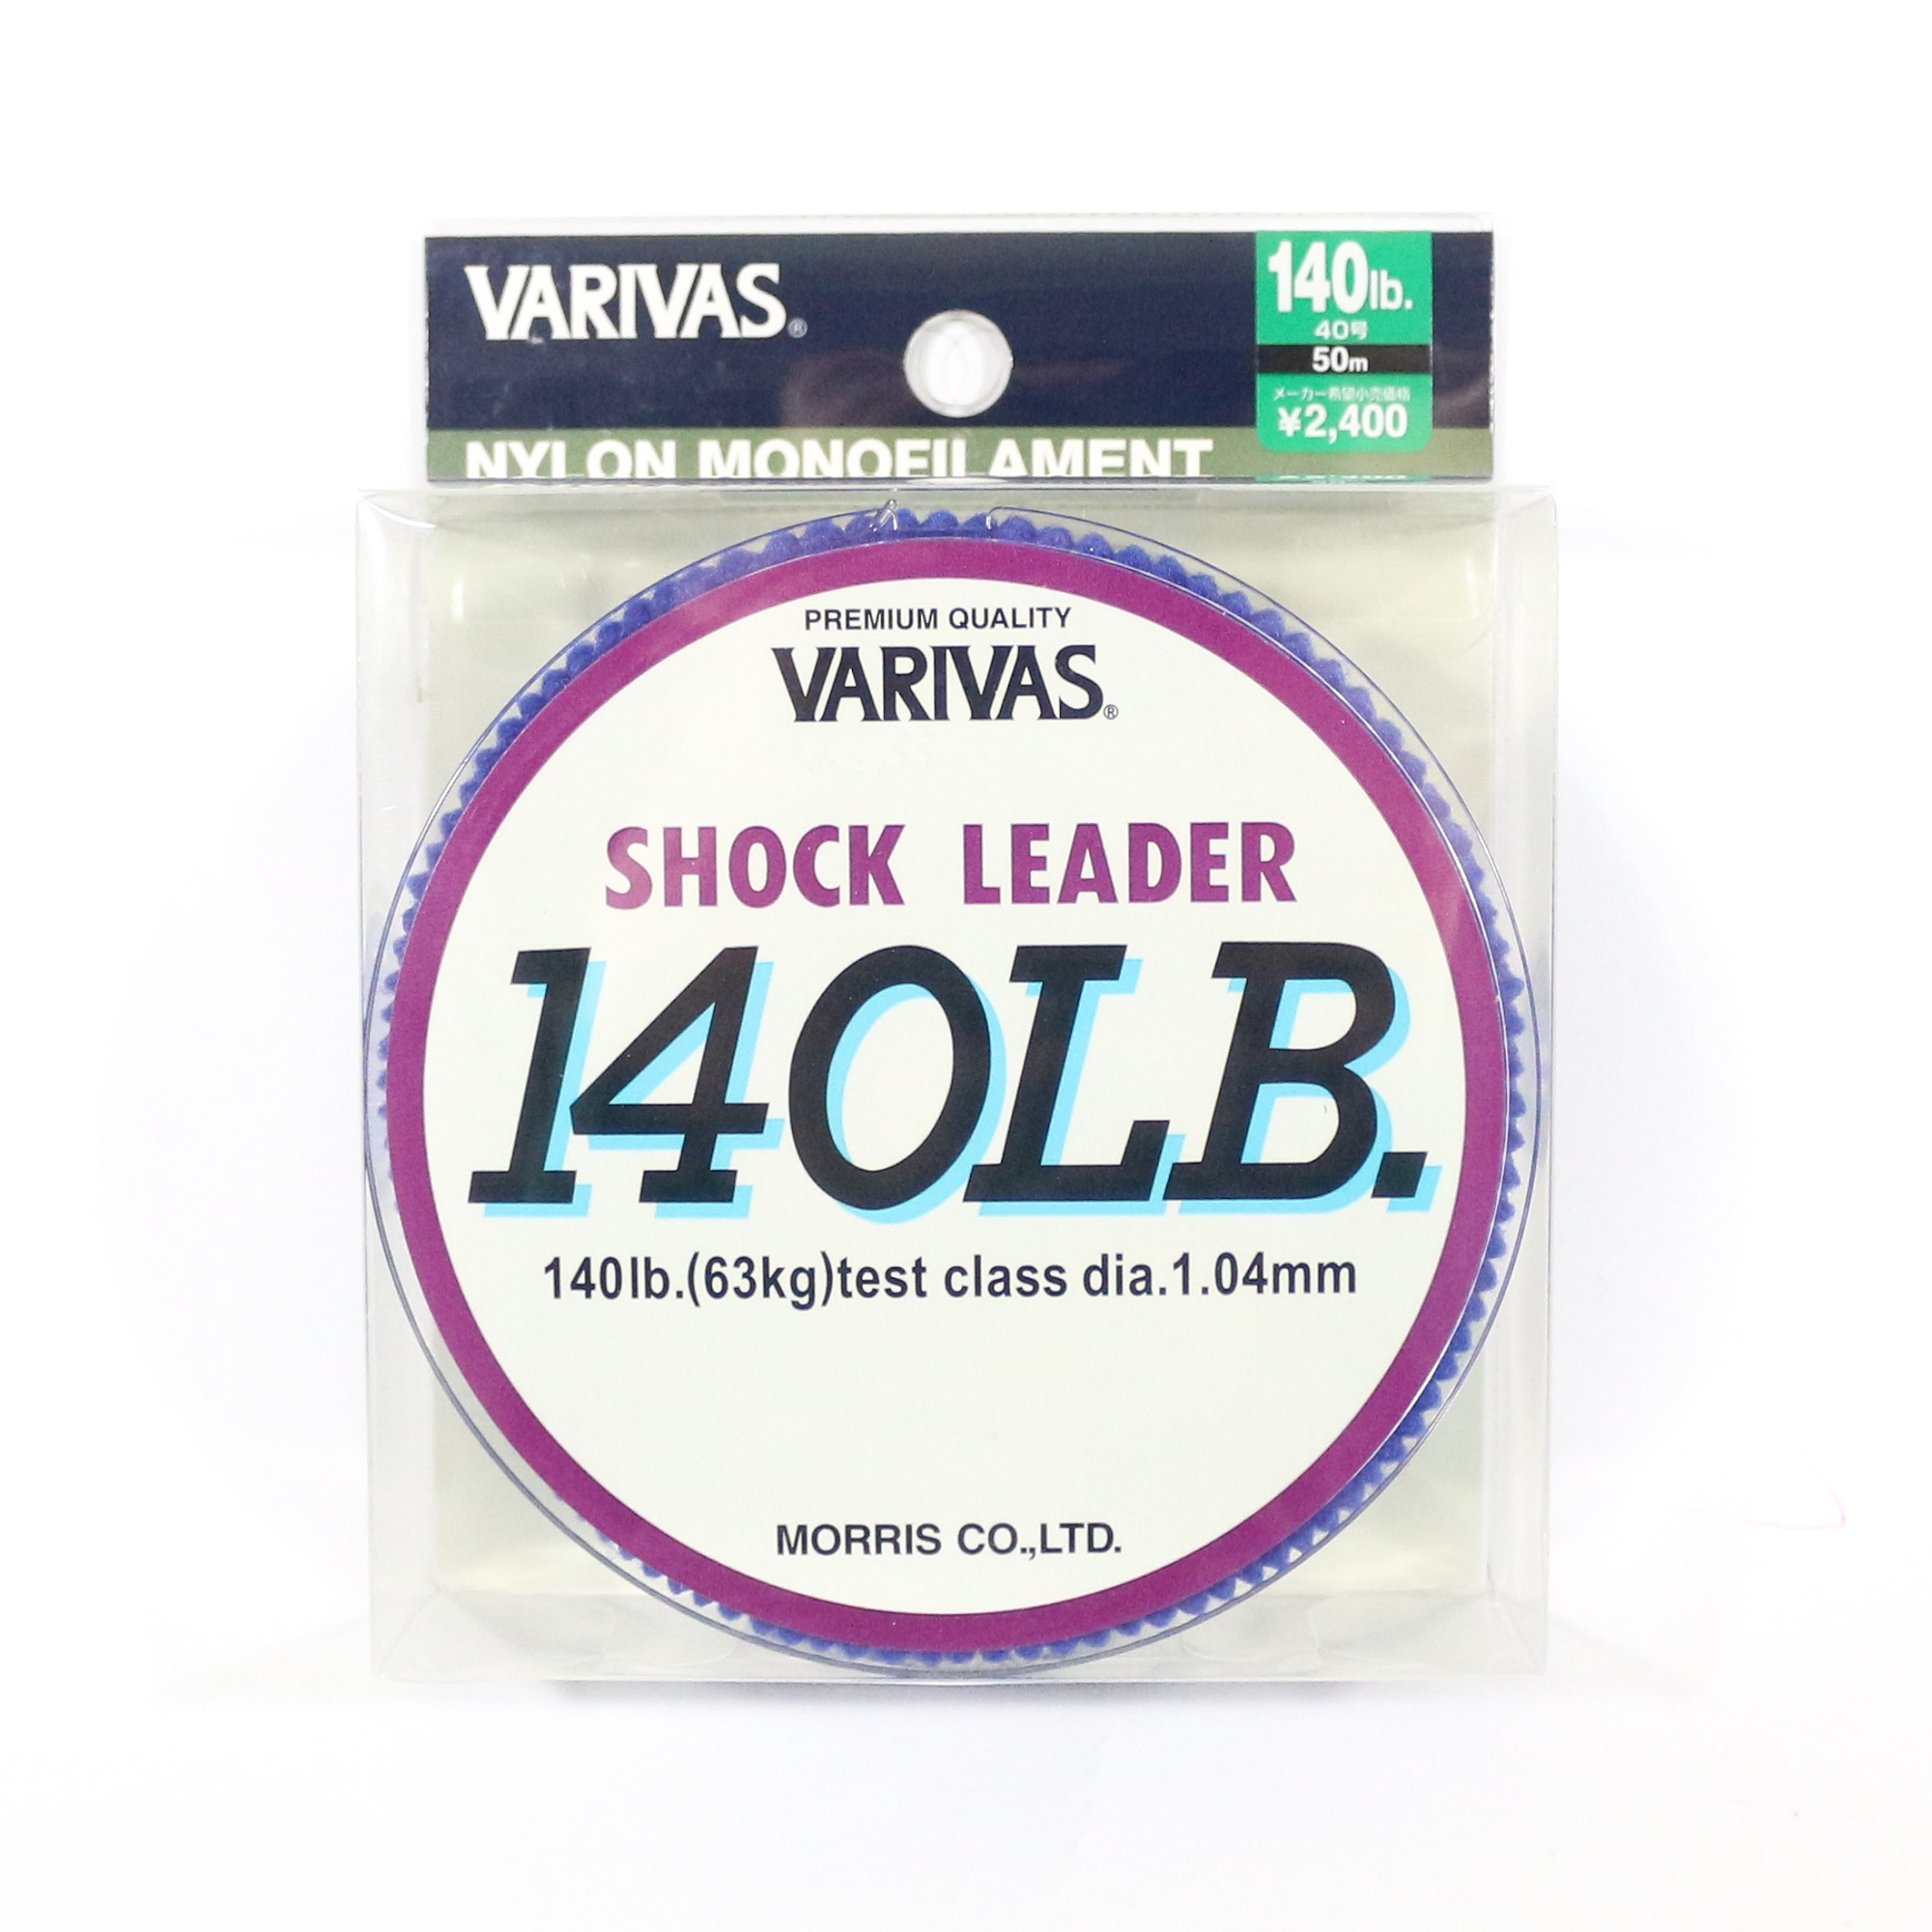 Varivas Nylon Shock Leader Line 50m 140lb (4800)